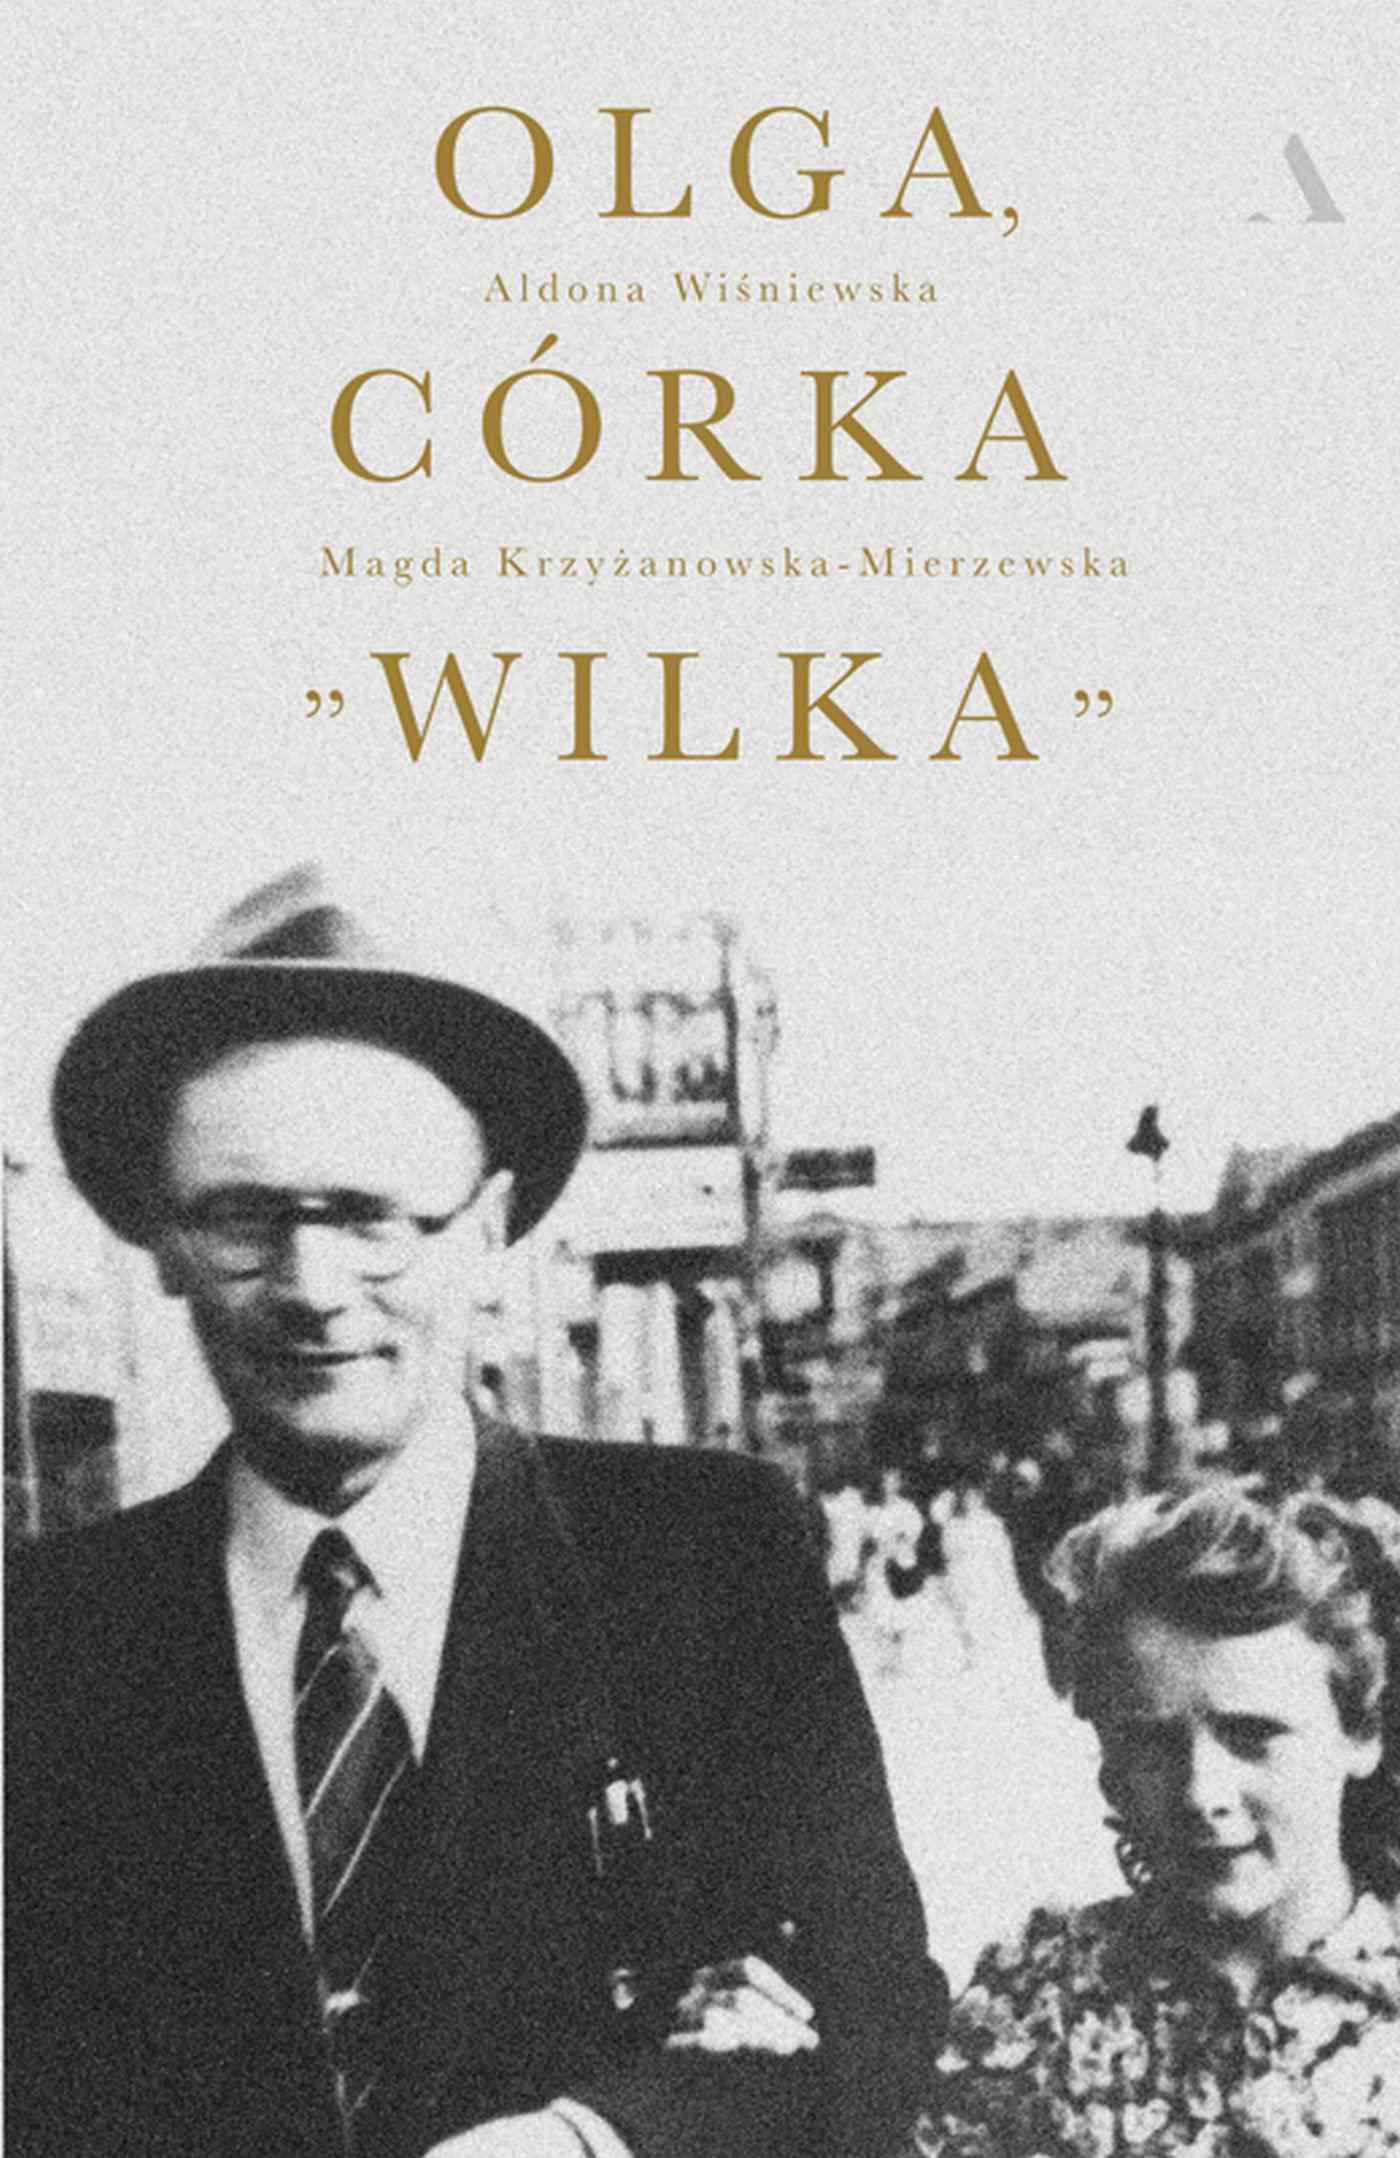 "Olga, córka ""Wilka"" - Ebook (Książka na Kindle) do pobrania w formacie MOBI"